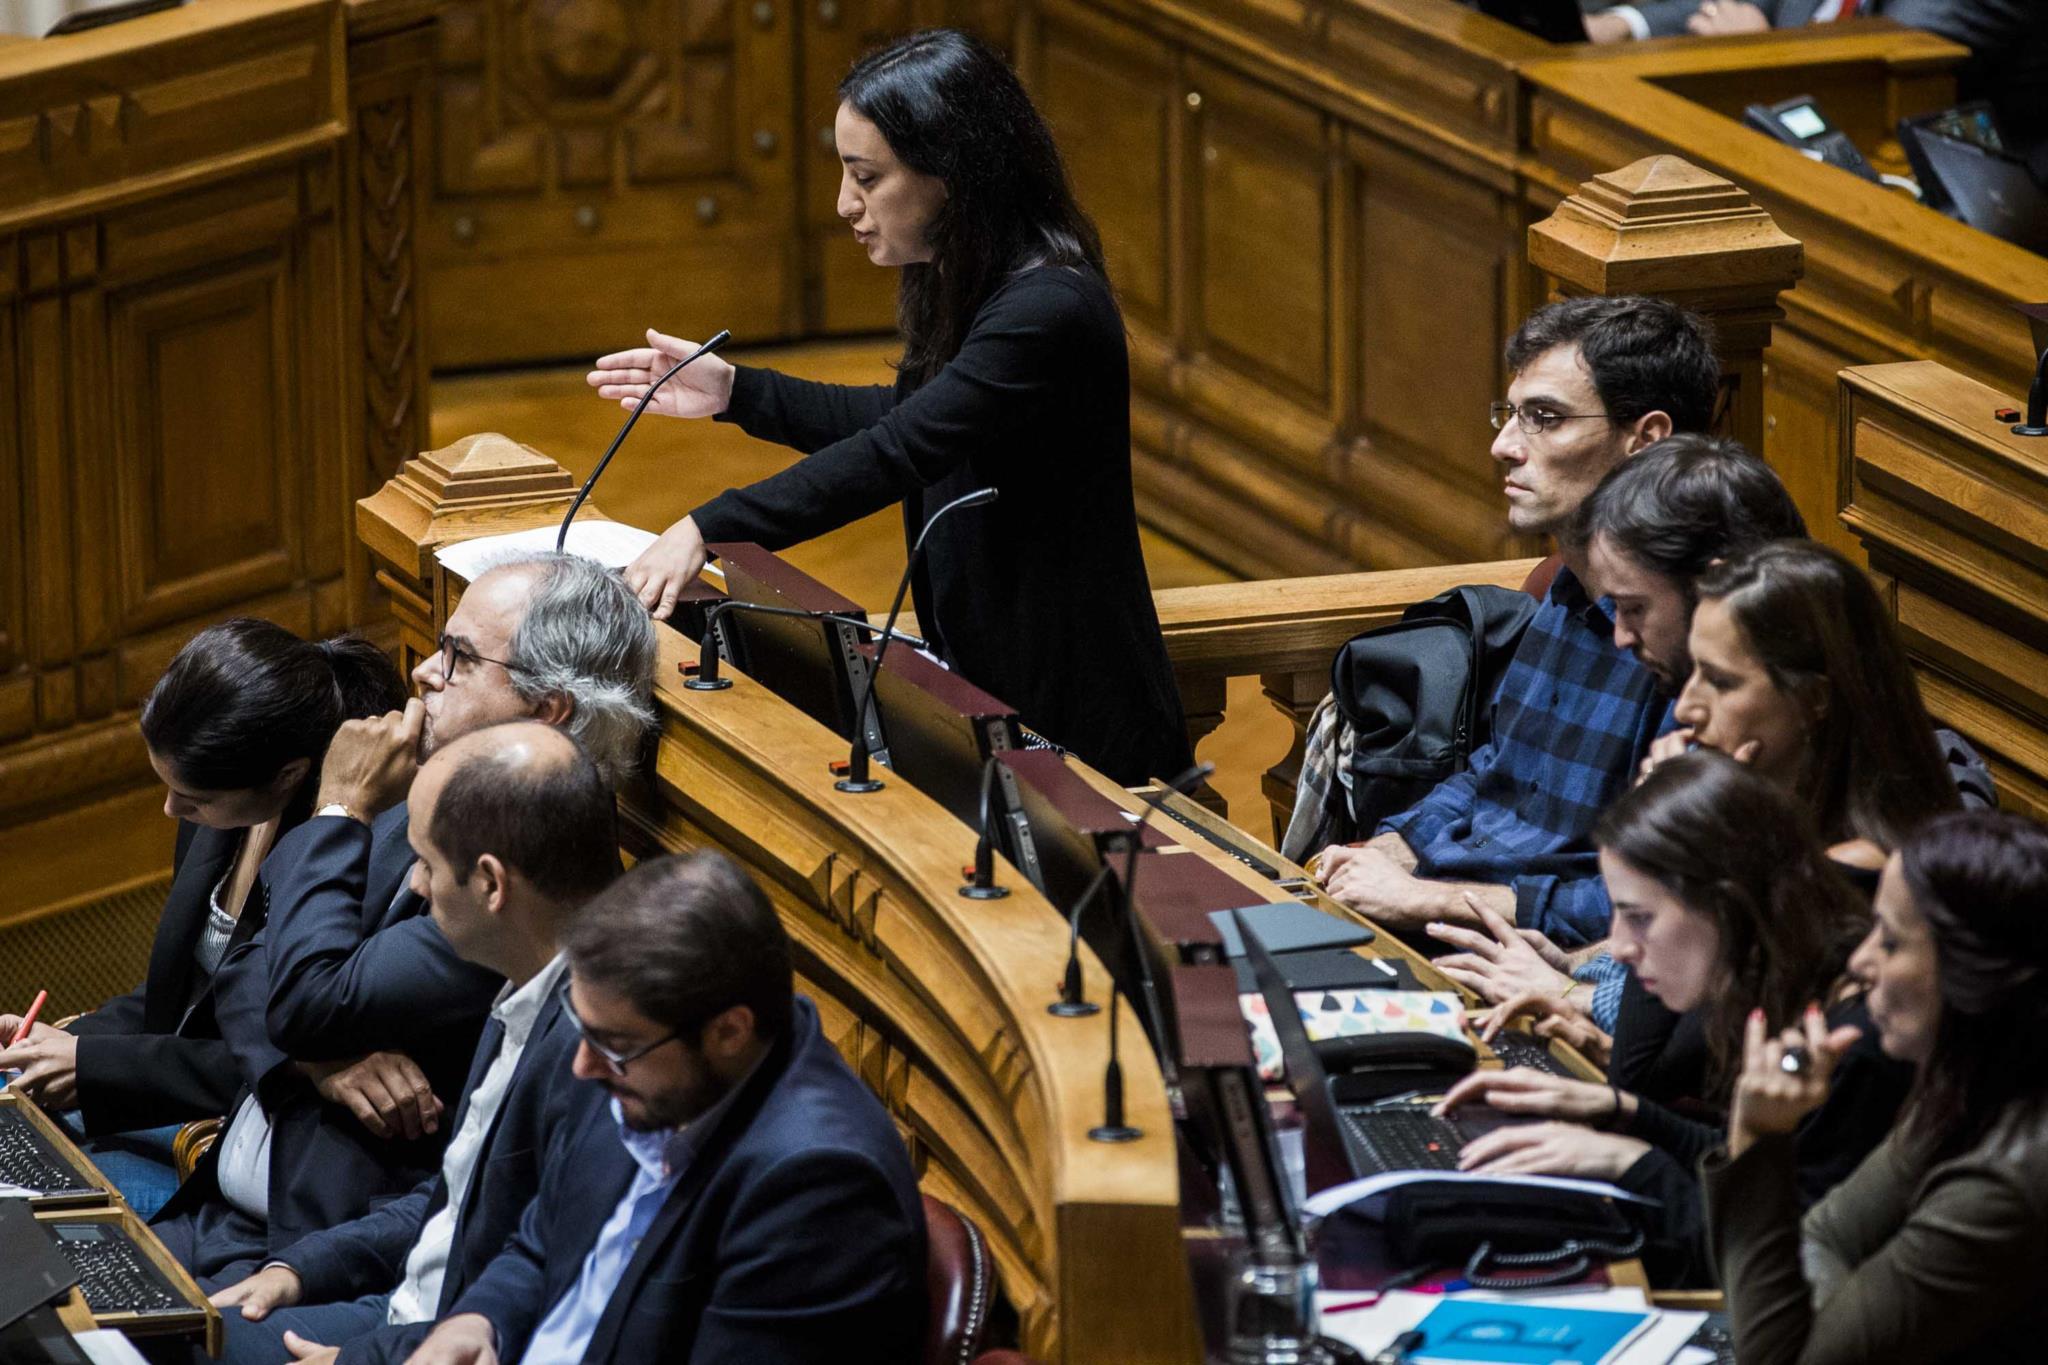 PÚBLICO - Isabel Pires e Ricardo Robles: a dupla do BE para Lisboa